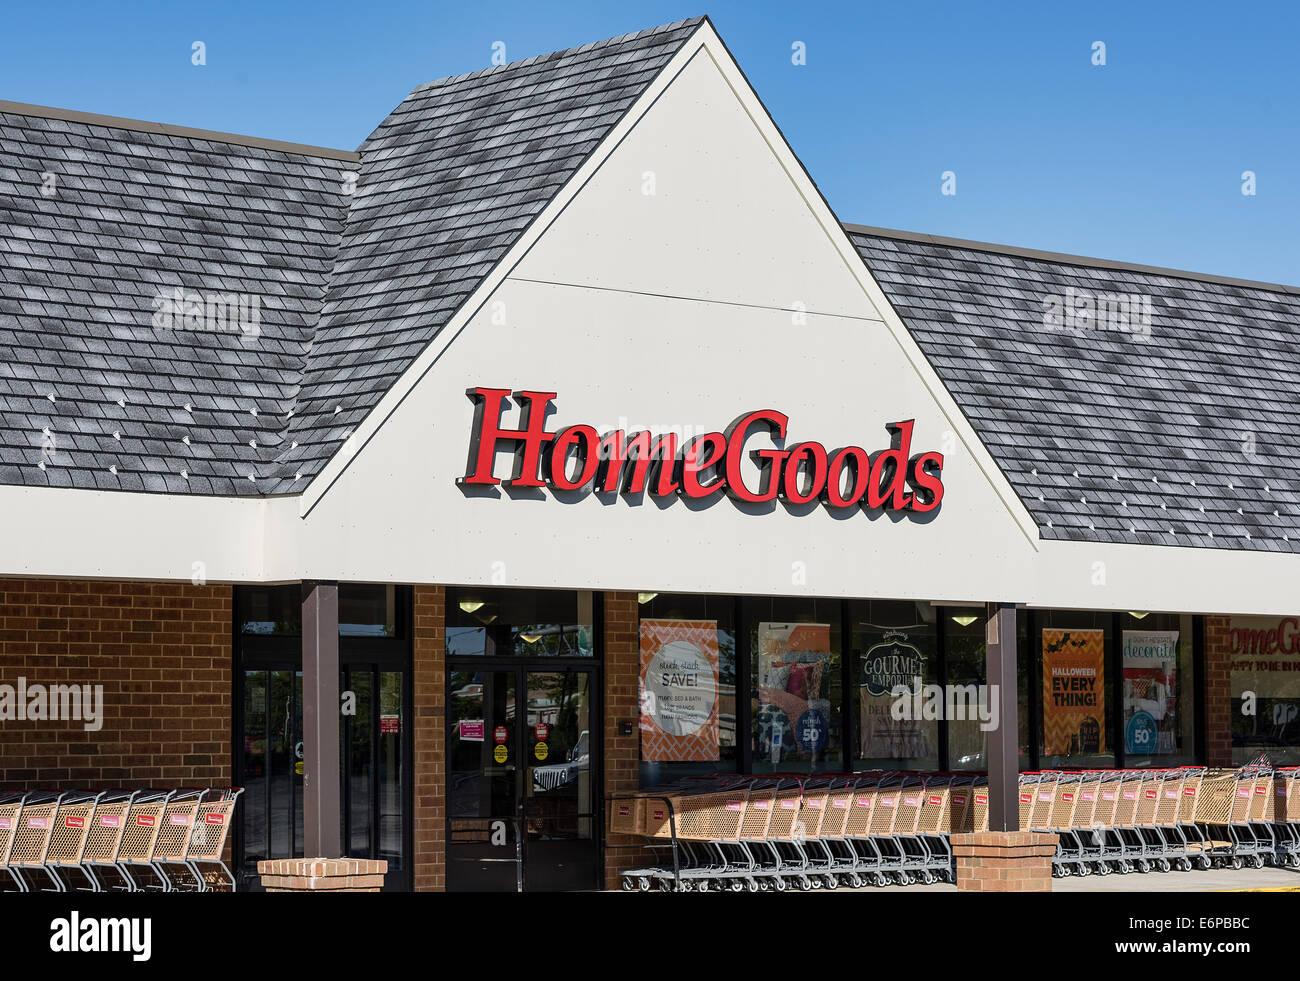 HomeGoods furnishing store exterior. - Stock Image